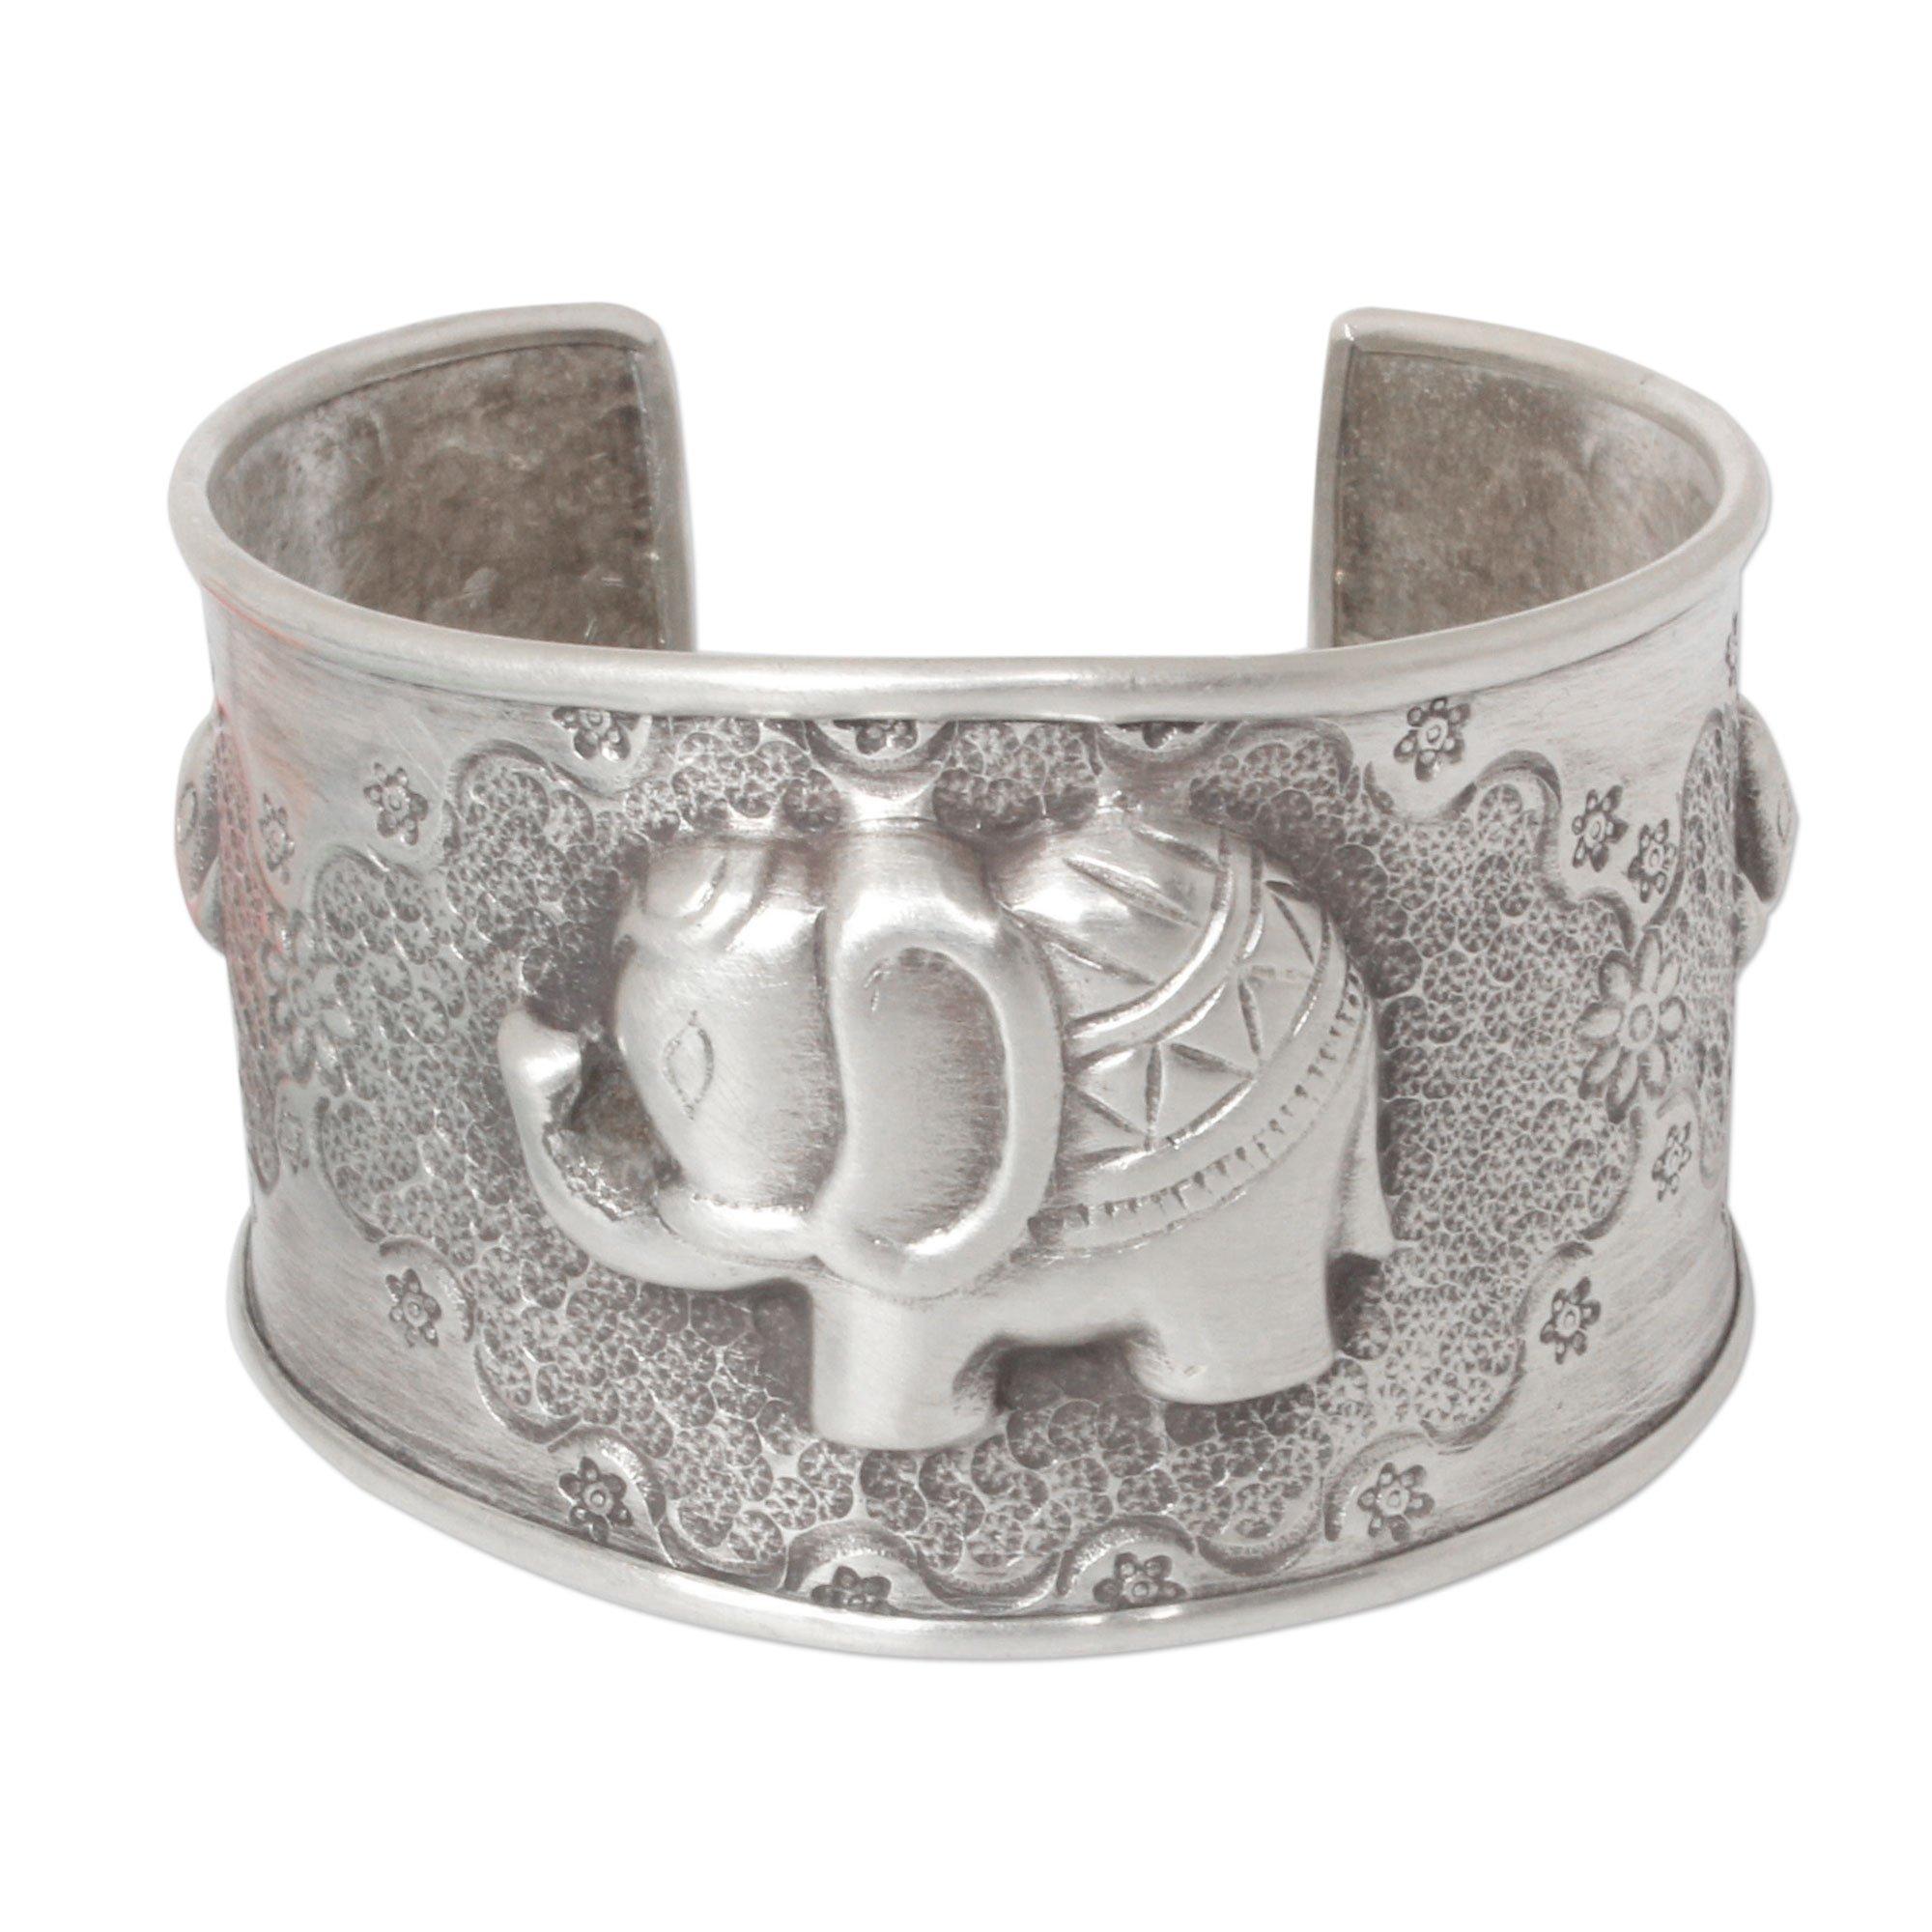 NOVICA .925 Sterling Silver Cuff Bracelet 'Hill Tribe Elephants'